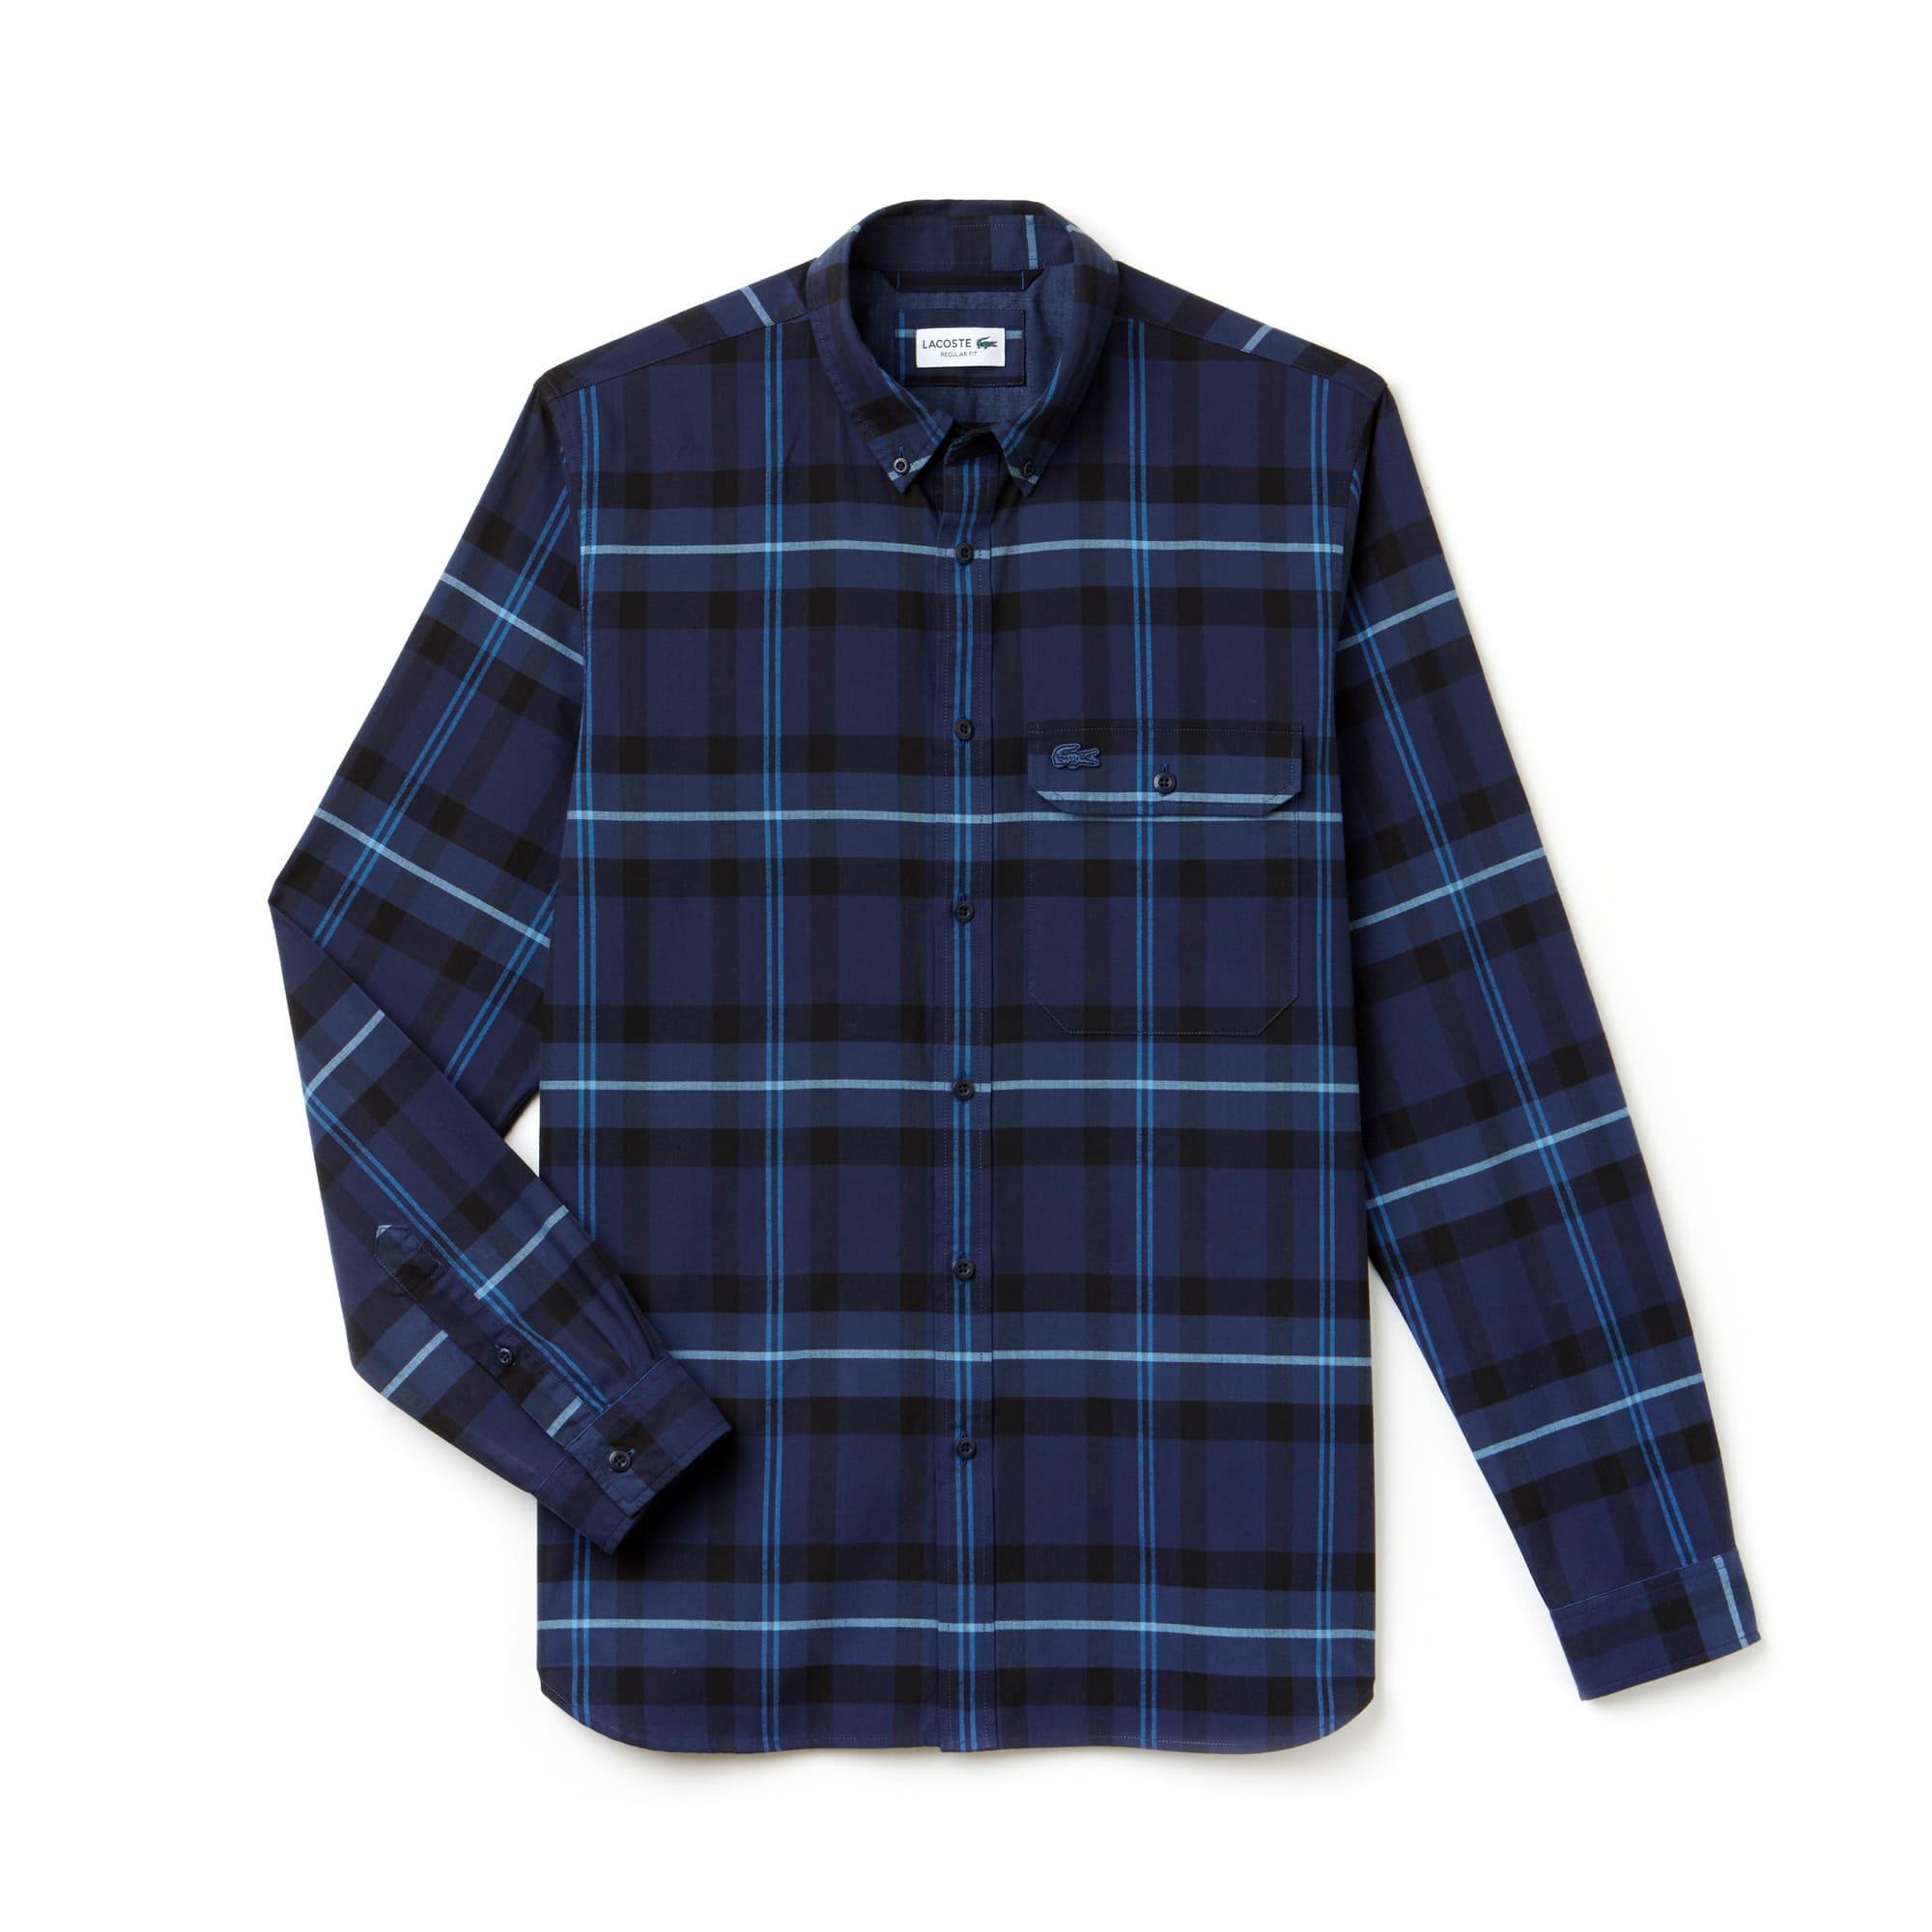 Men's Regular Fit Tartan Cotton Poplin Shirt